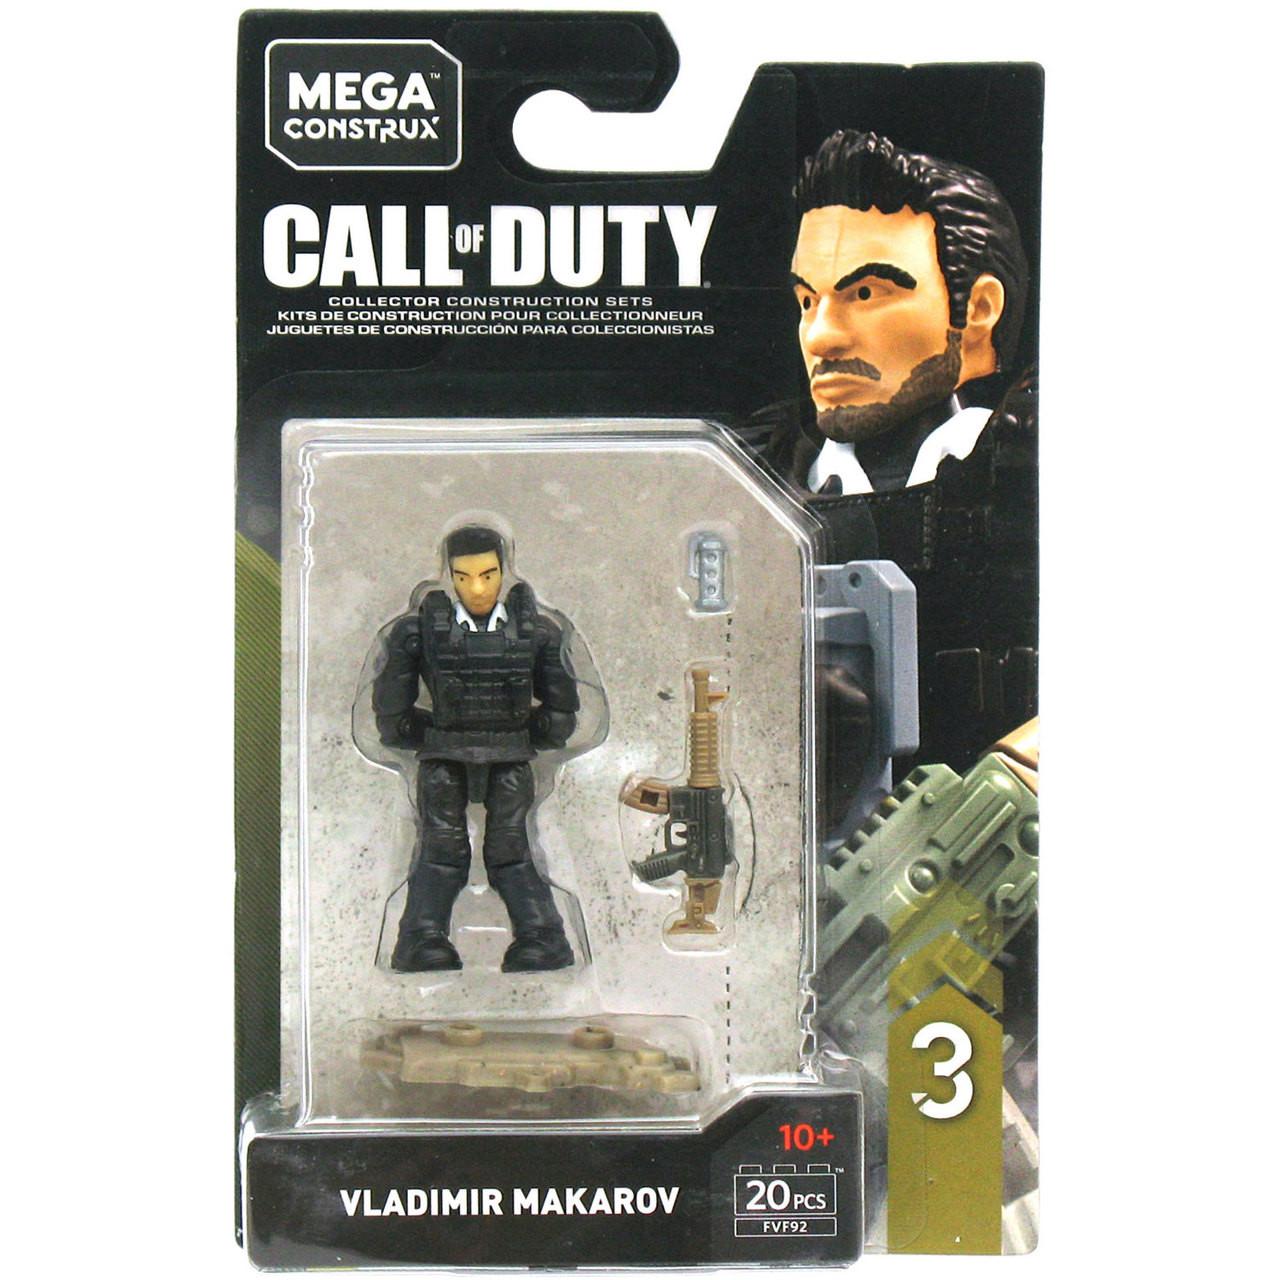 Mega Construx Call Of Duty Specialists Series 3 Vladimir Makarov Figure Bubble N Squeak Toys